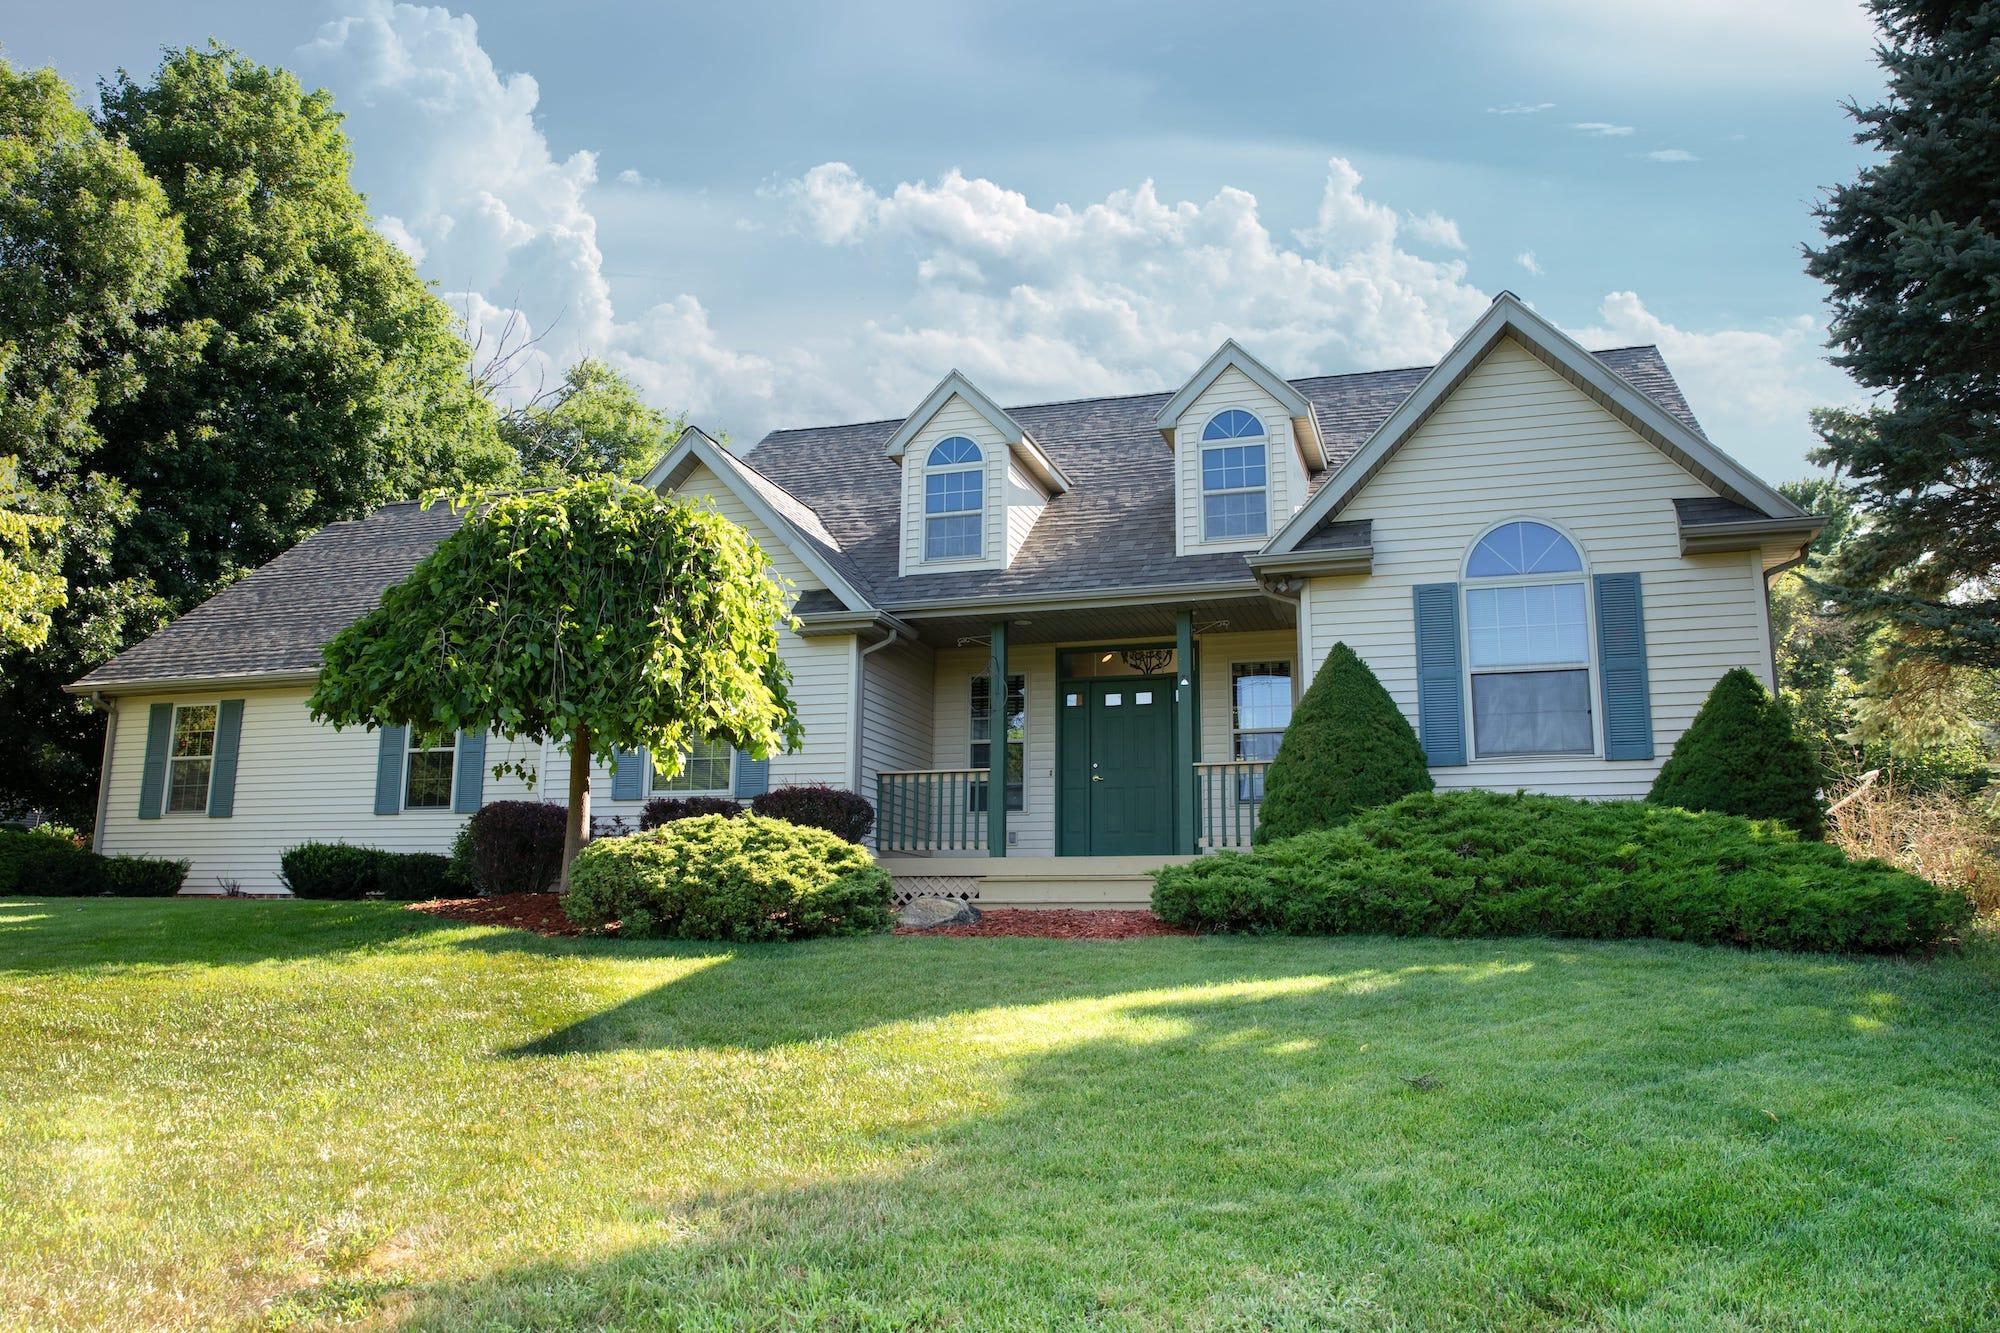 Parent Remodeling, LLC - Roofing, Kitchen and Bath Remodel